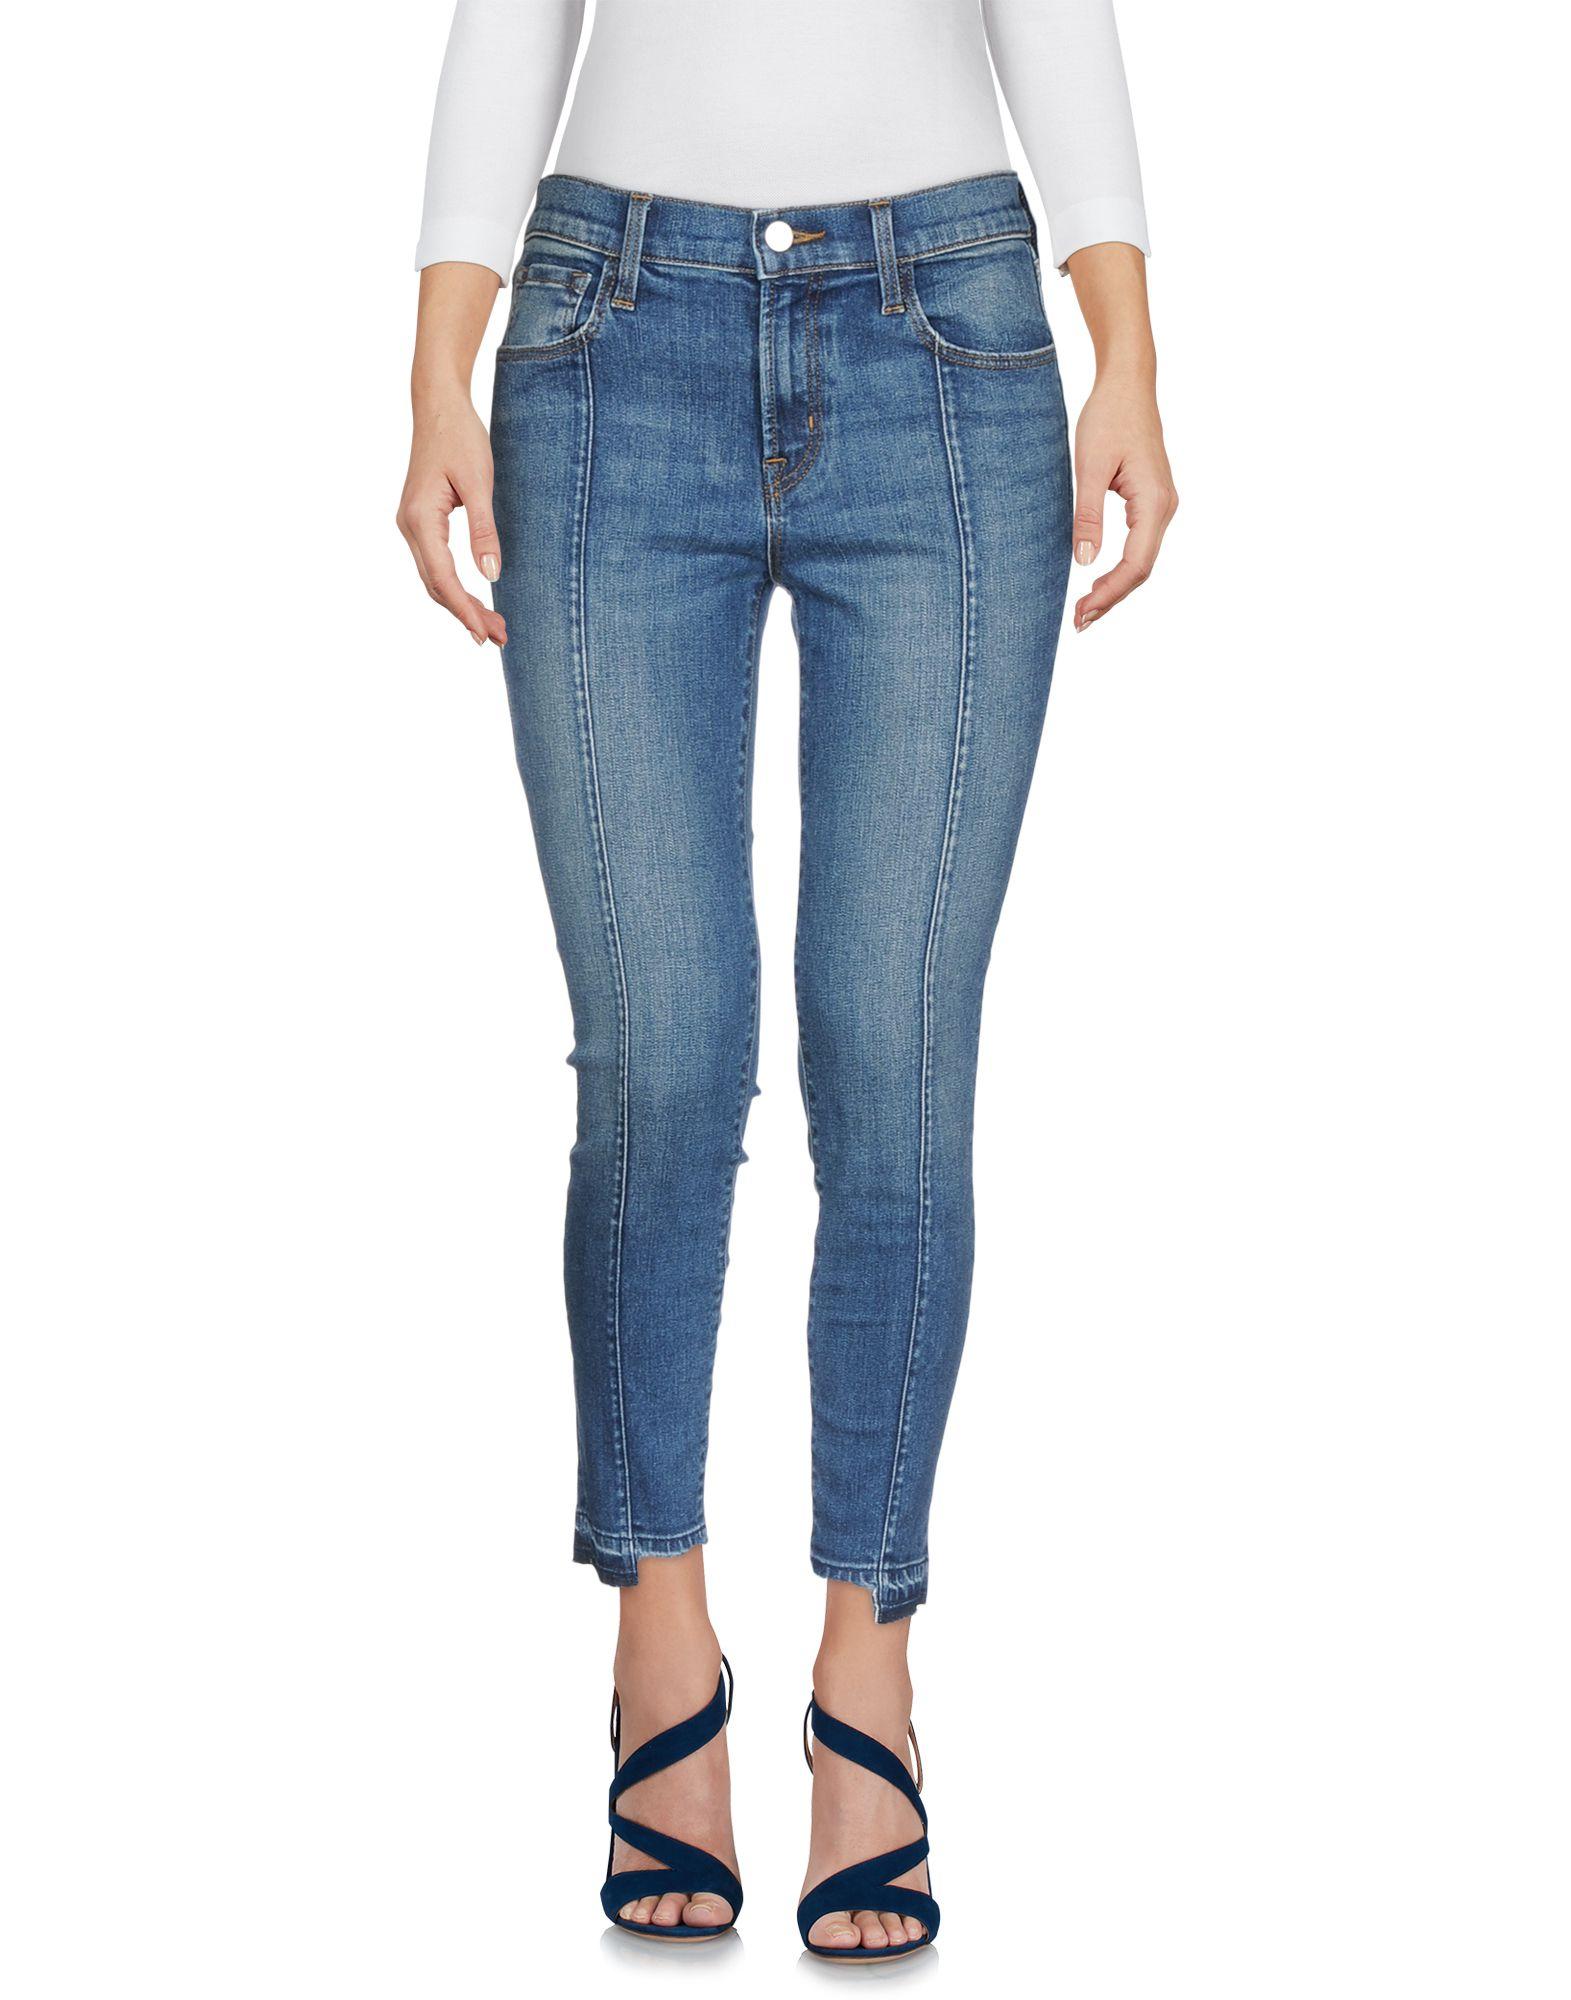 Pantaloni Jeans J Brand Donna - Acquista online su DFa2DR2UNd